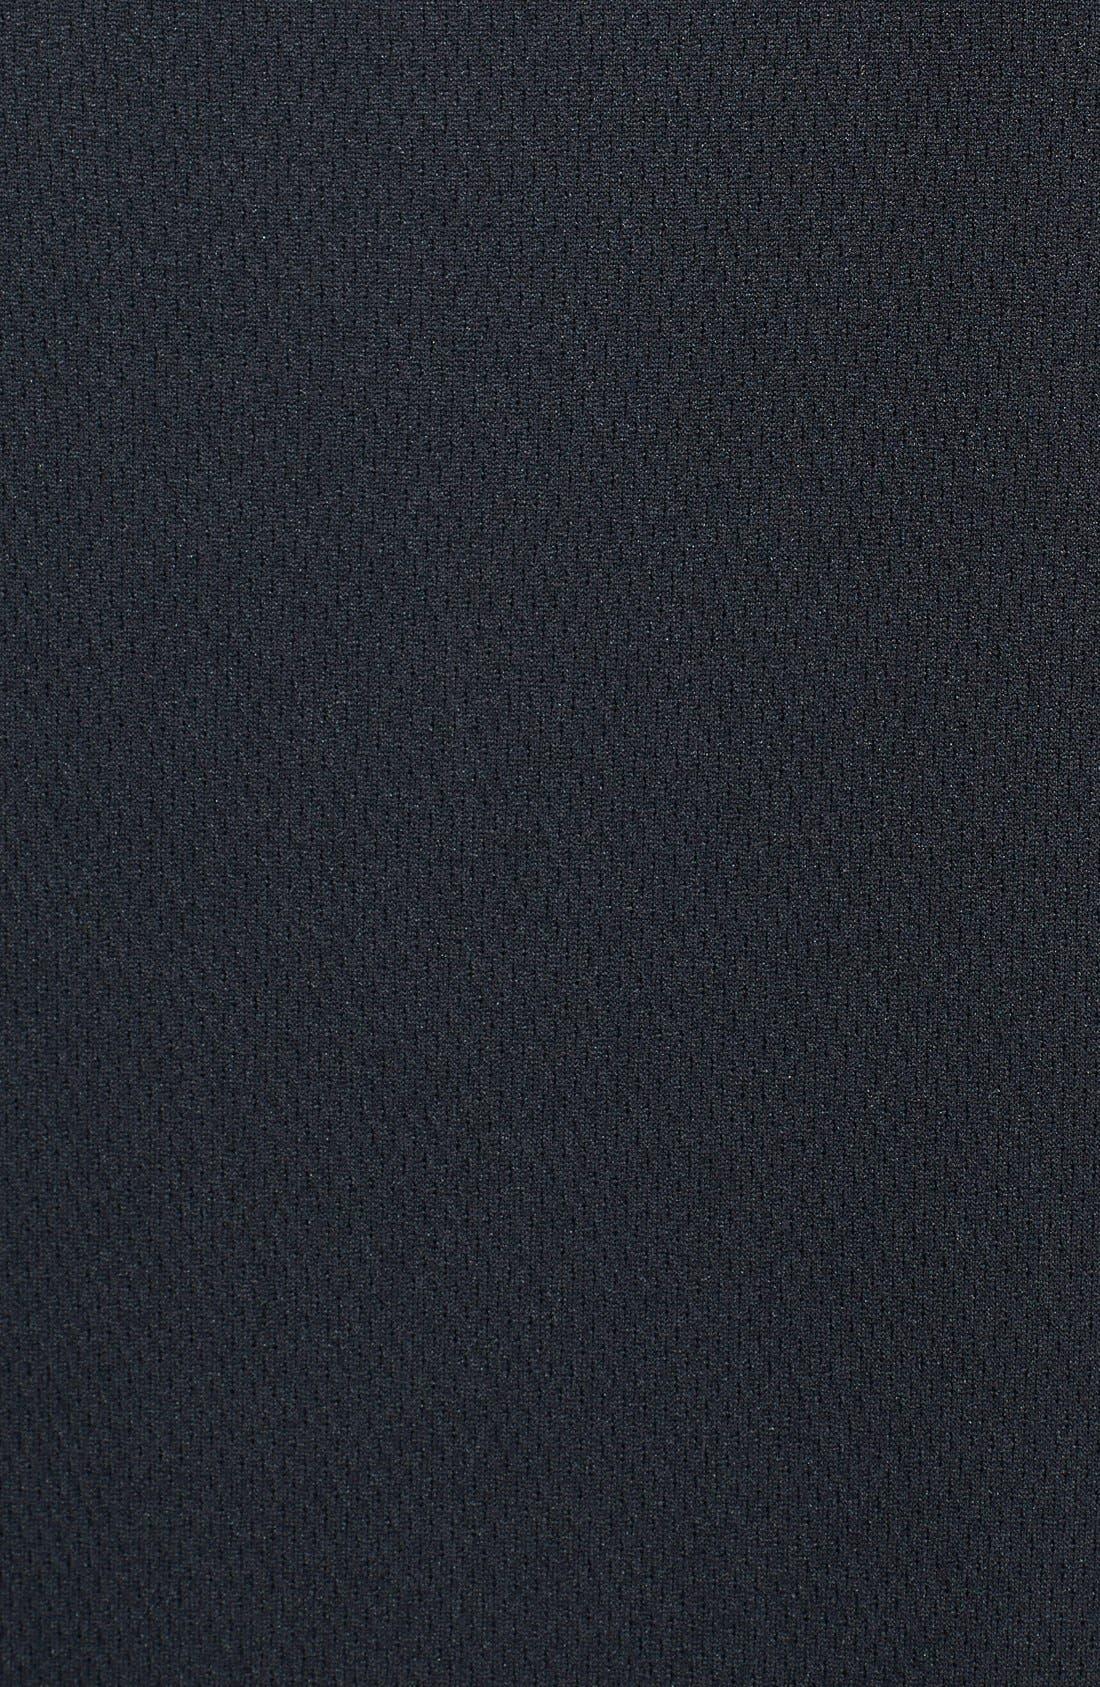 New Orleans Saints - Edge DryTec Moisture Wicking Half Zip Pullover,                             Alternate thumbnail 3, color,                             Black